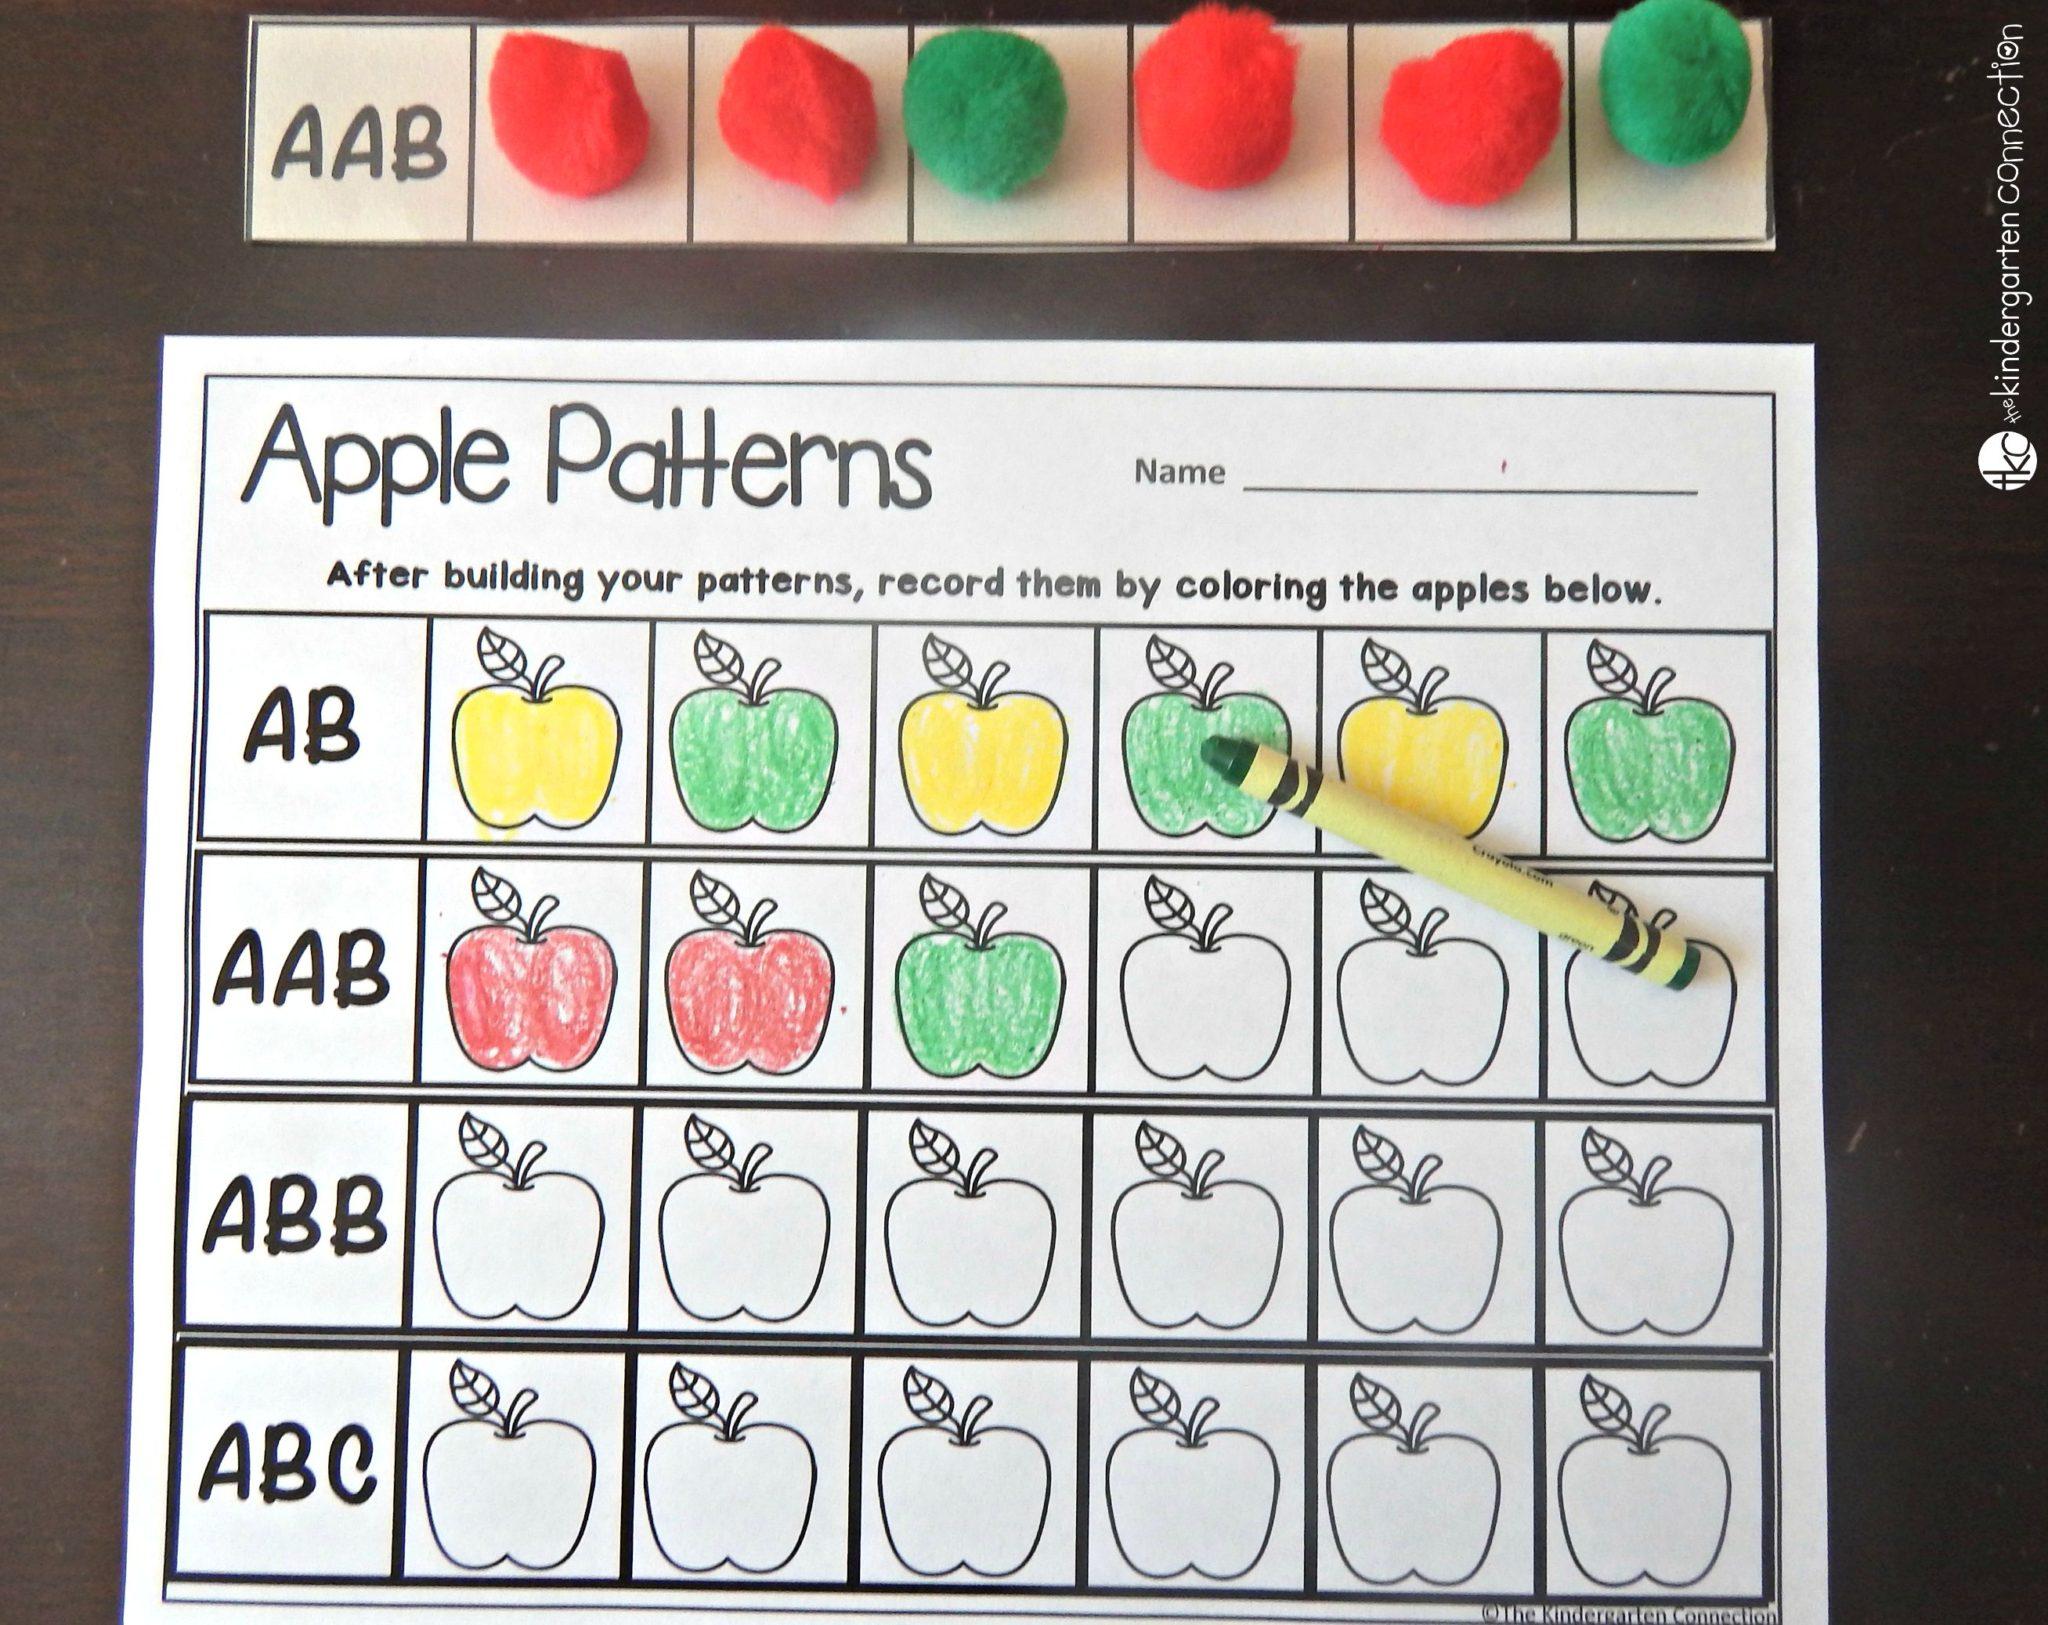 Apple Patterns - The Kindergarten Connection